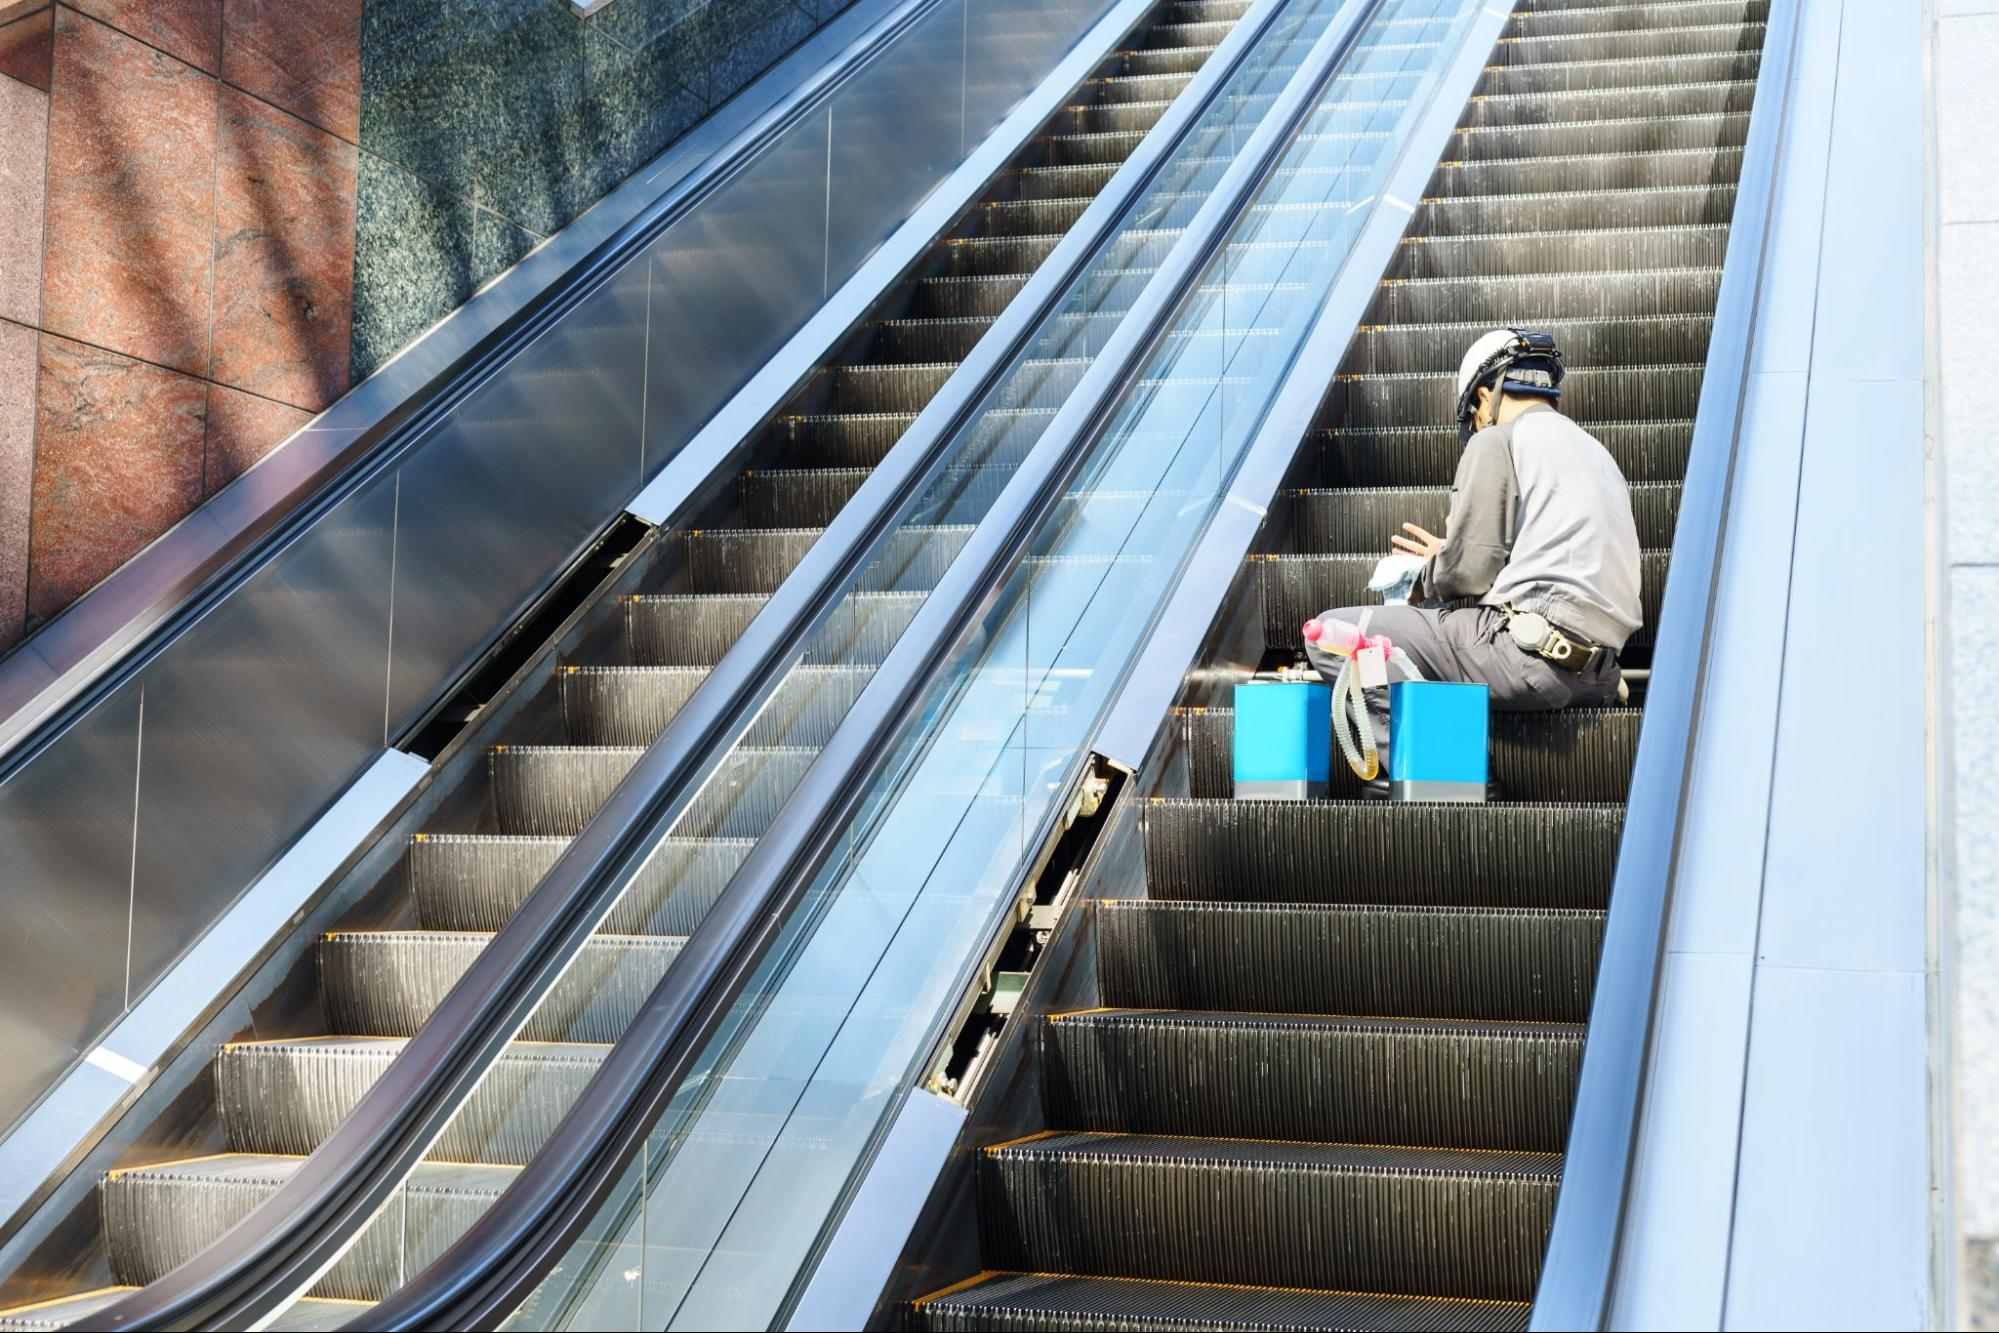 Maintenance person working on an escalator